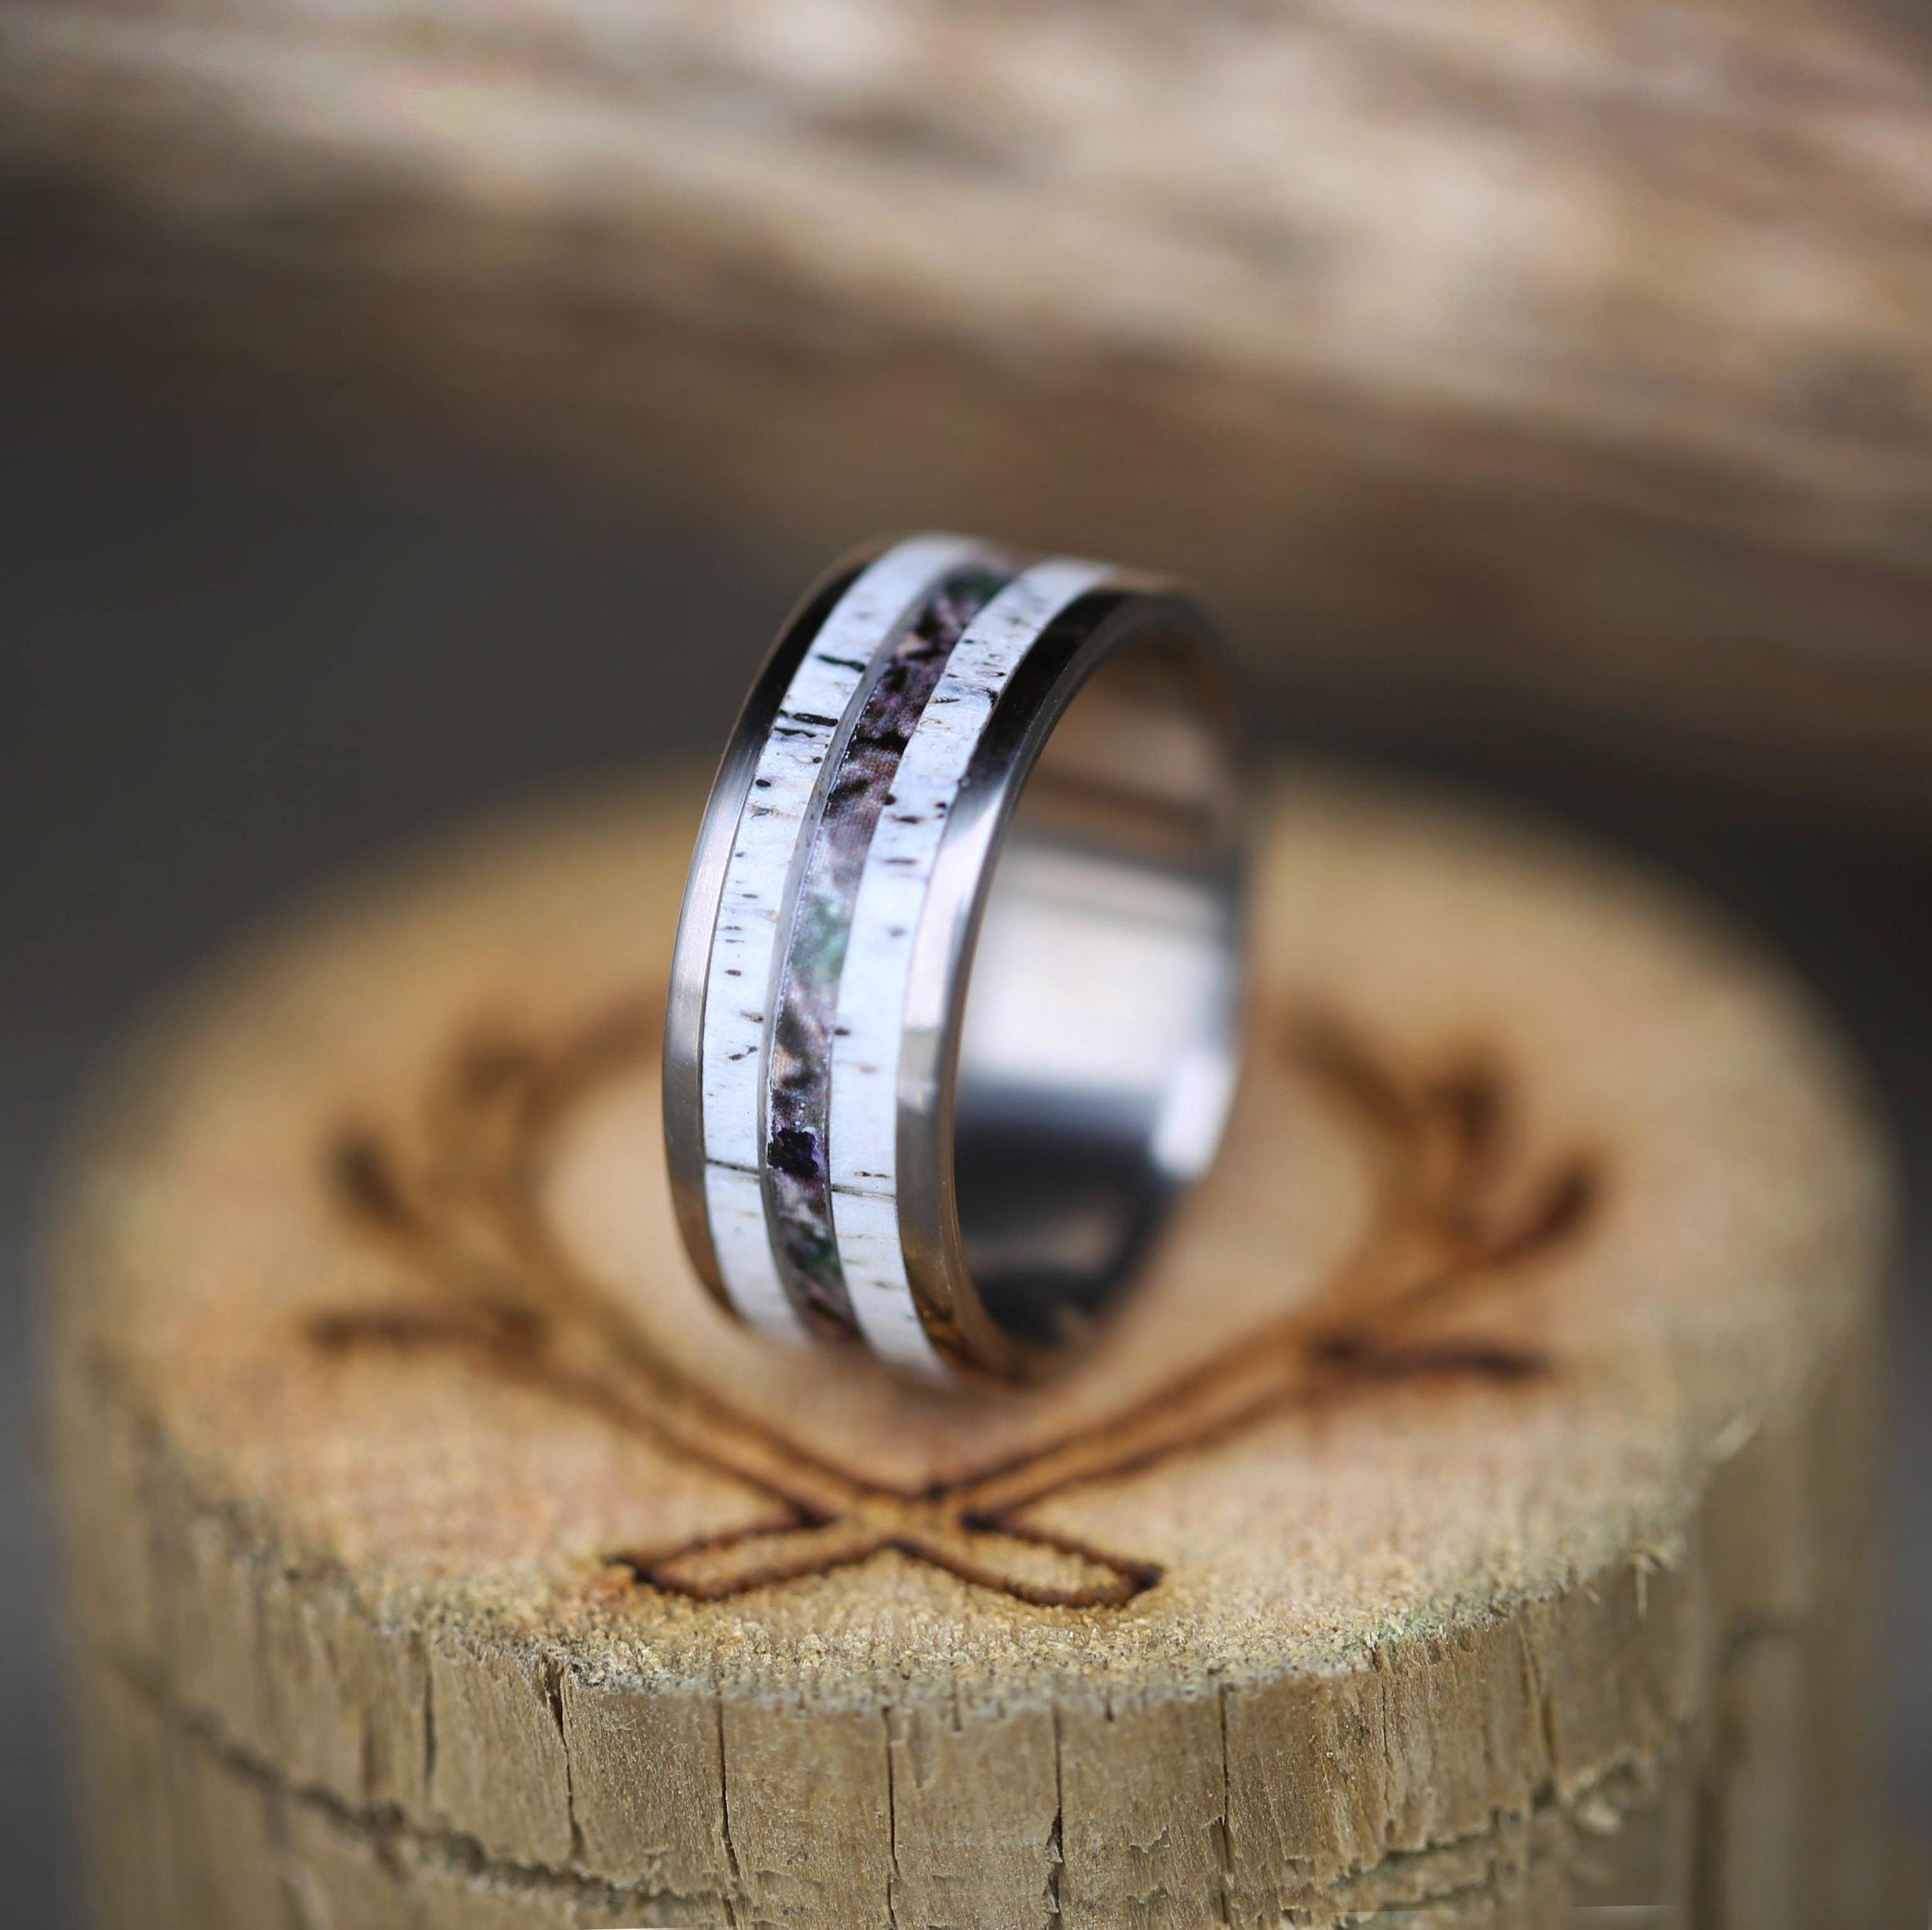 ELK ANTLER CAMO WEDDING BAND available in titanium silver or